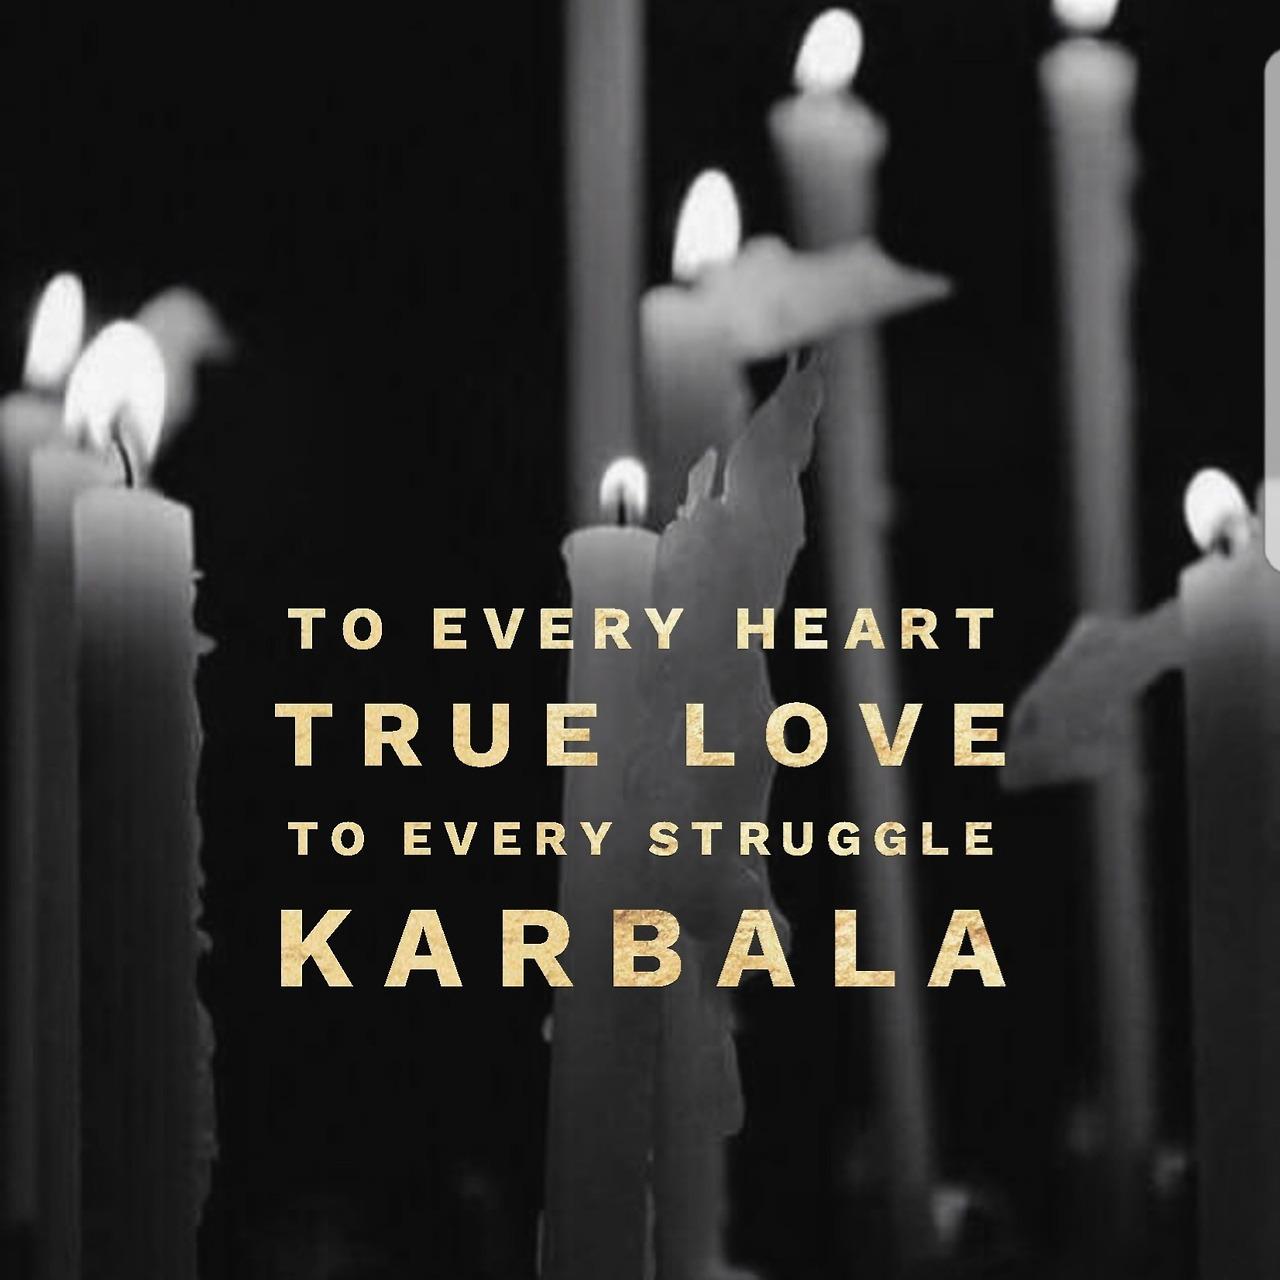 Imam Hussain, Ya Hussain,To Every Heart To Every Struggle, Karbala,TO Every Heart True Love, To Every Struggle Karbala